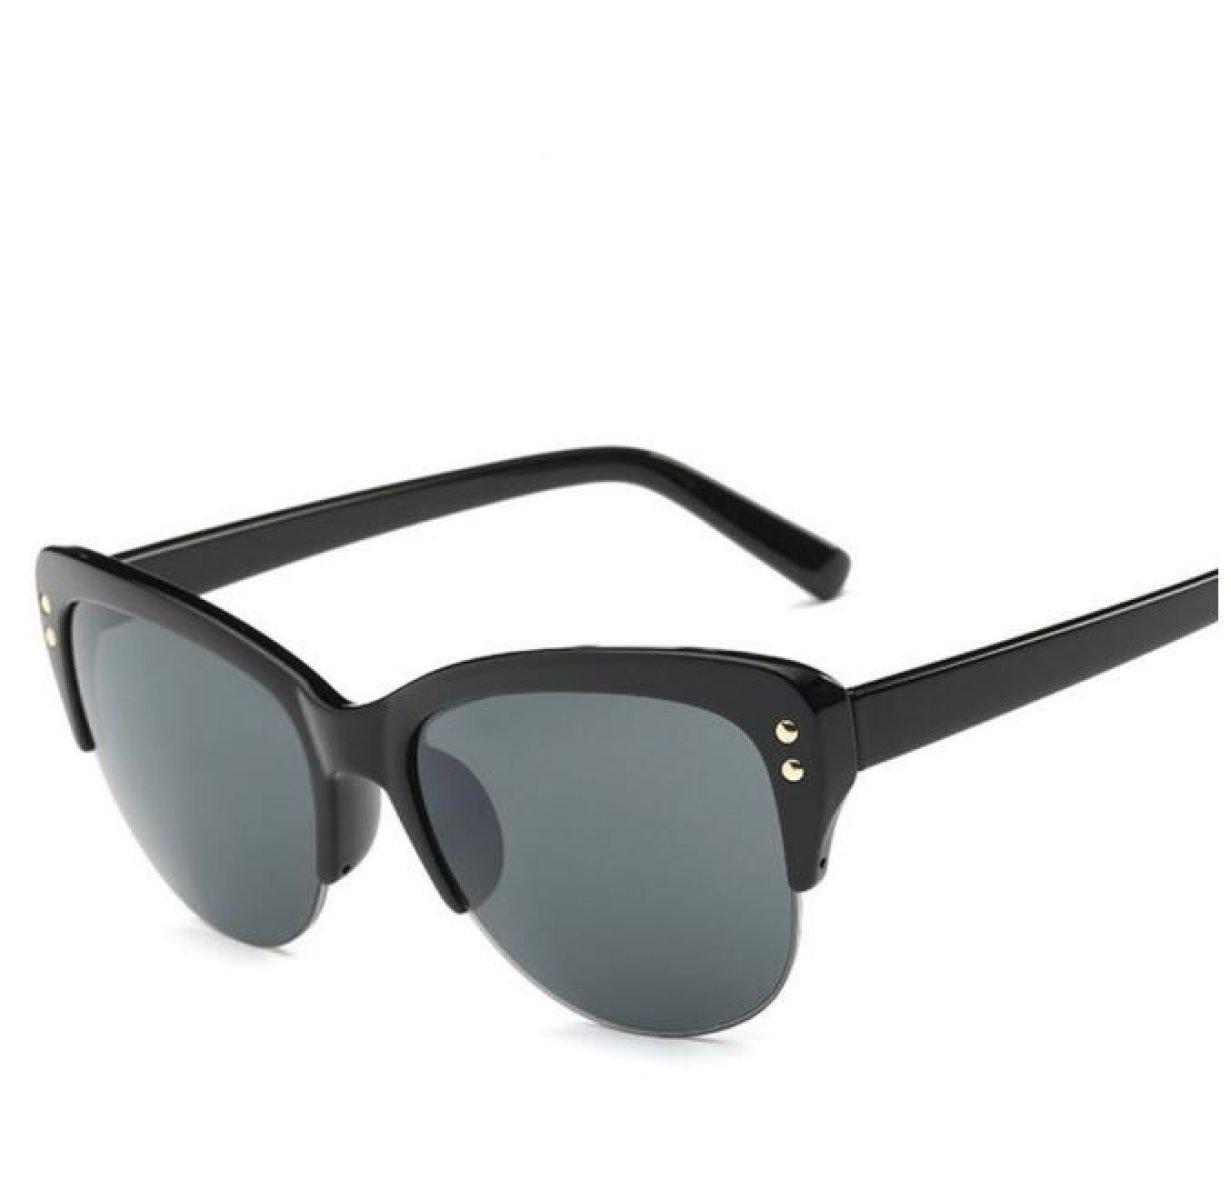 Neue Augenmode Katze Sonnenbrille Frau Bunte Sonnenbrille,A5IceBlueTablets